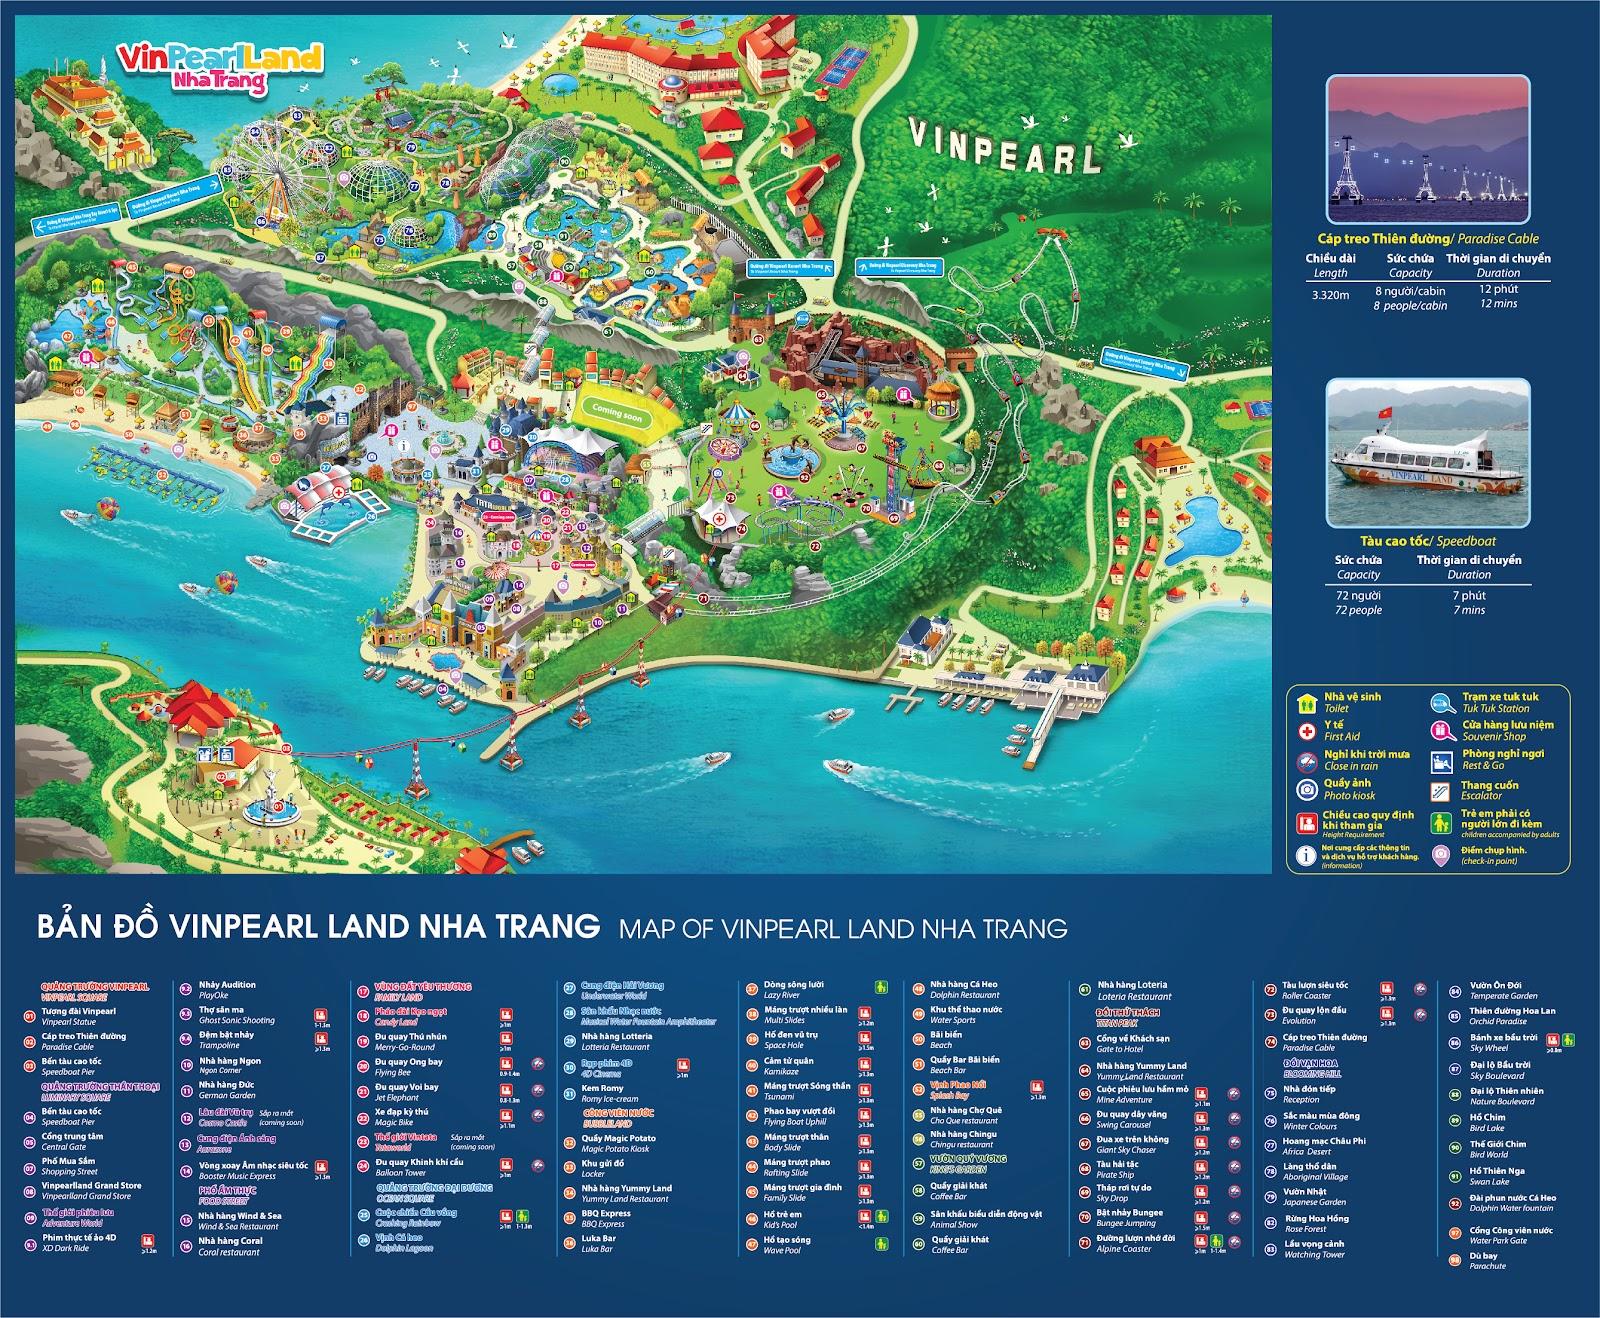 Vinpearl-Land-Nha-Trang-map